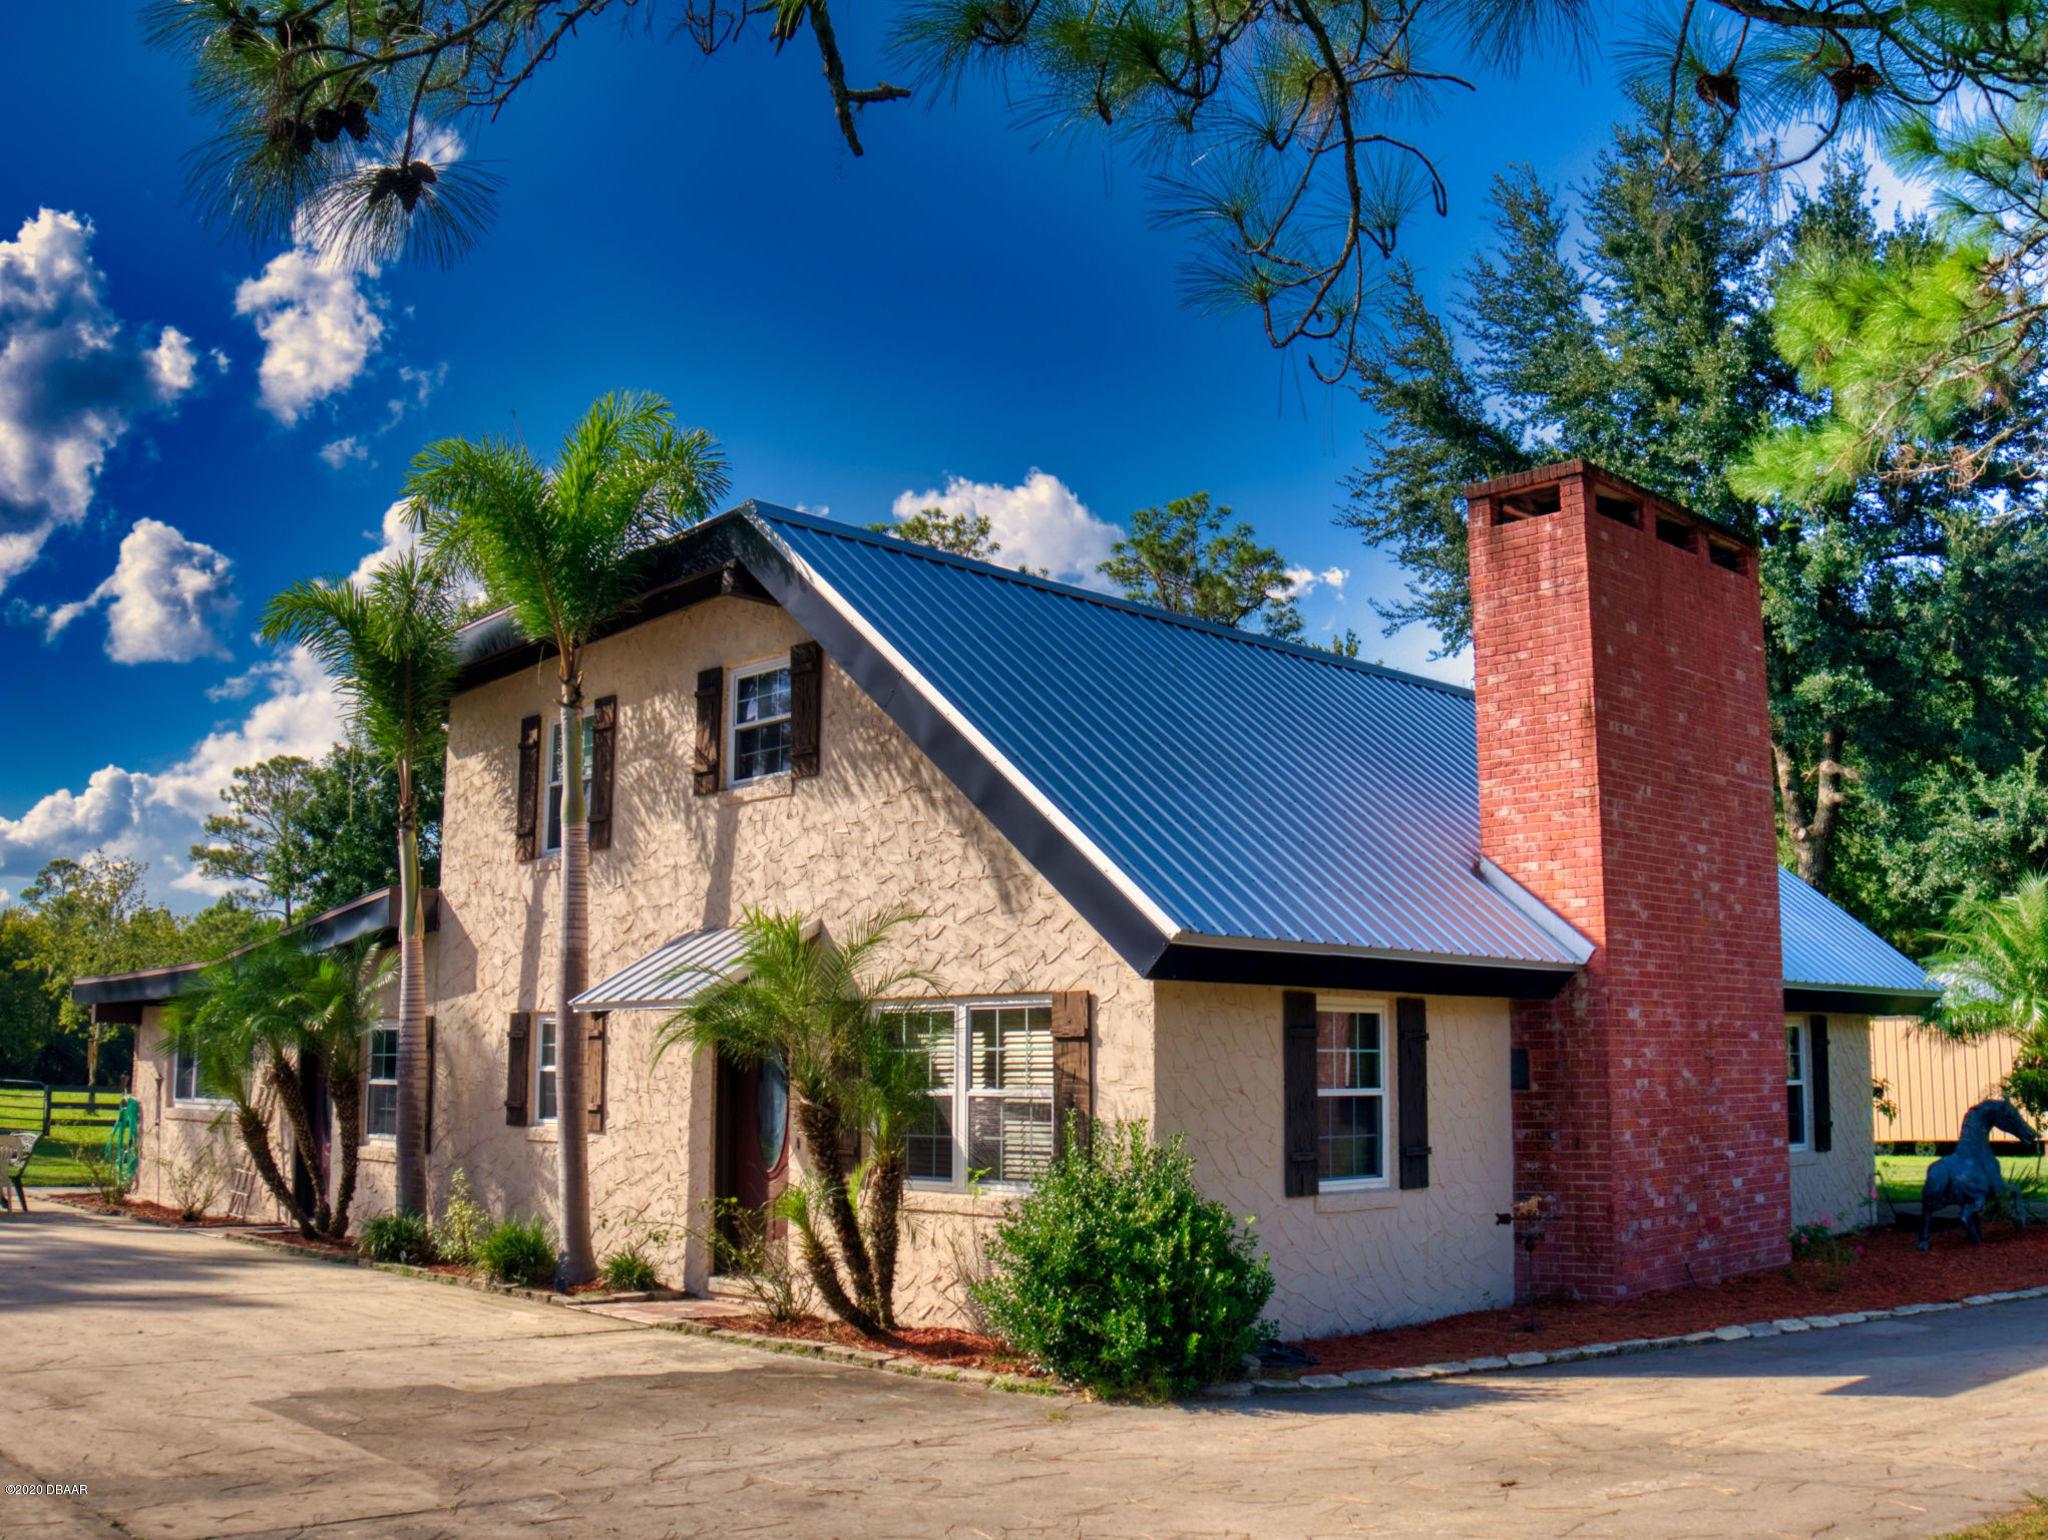 Photo of 2336 Meadow Lane, Port Orange, FL 32128